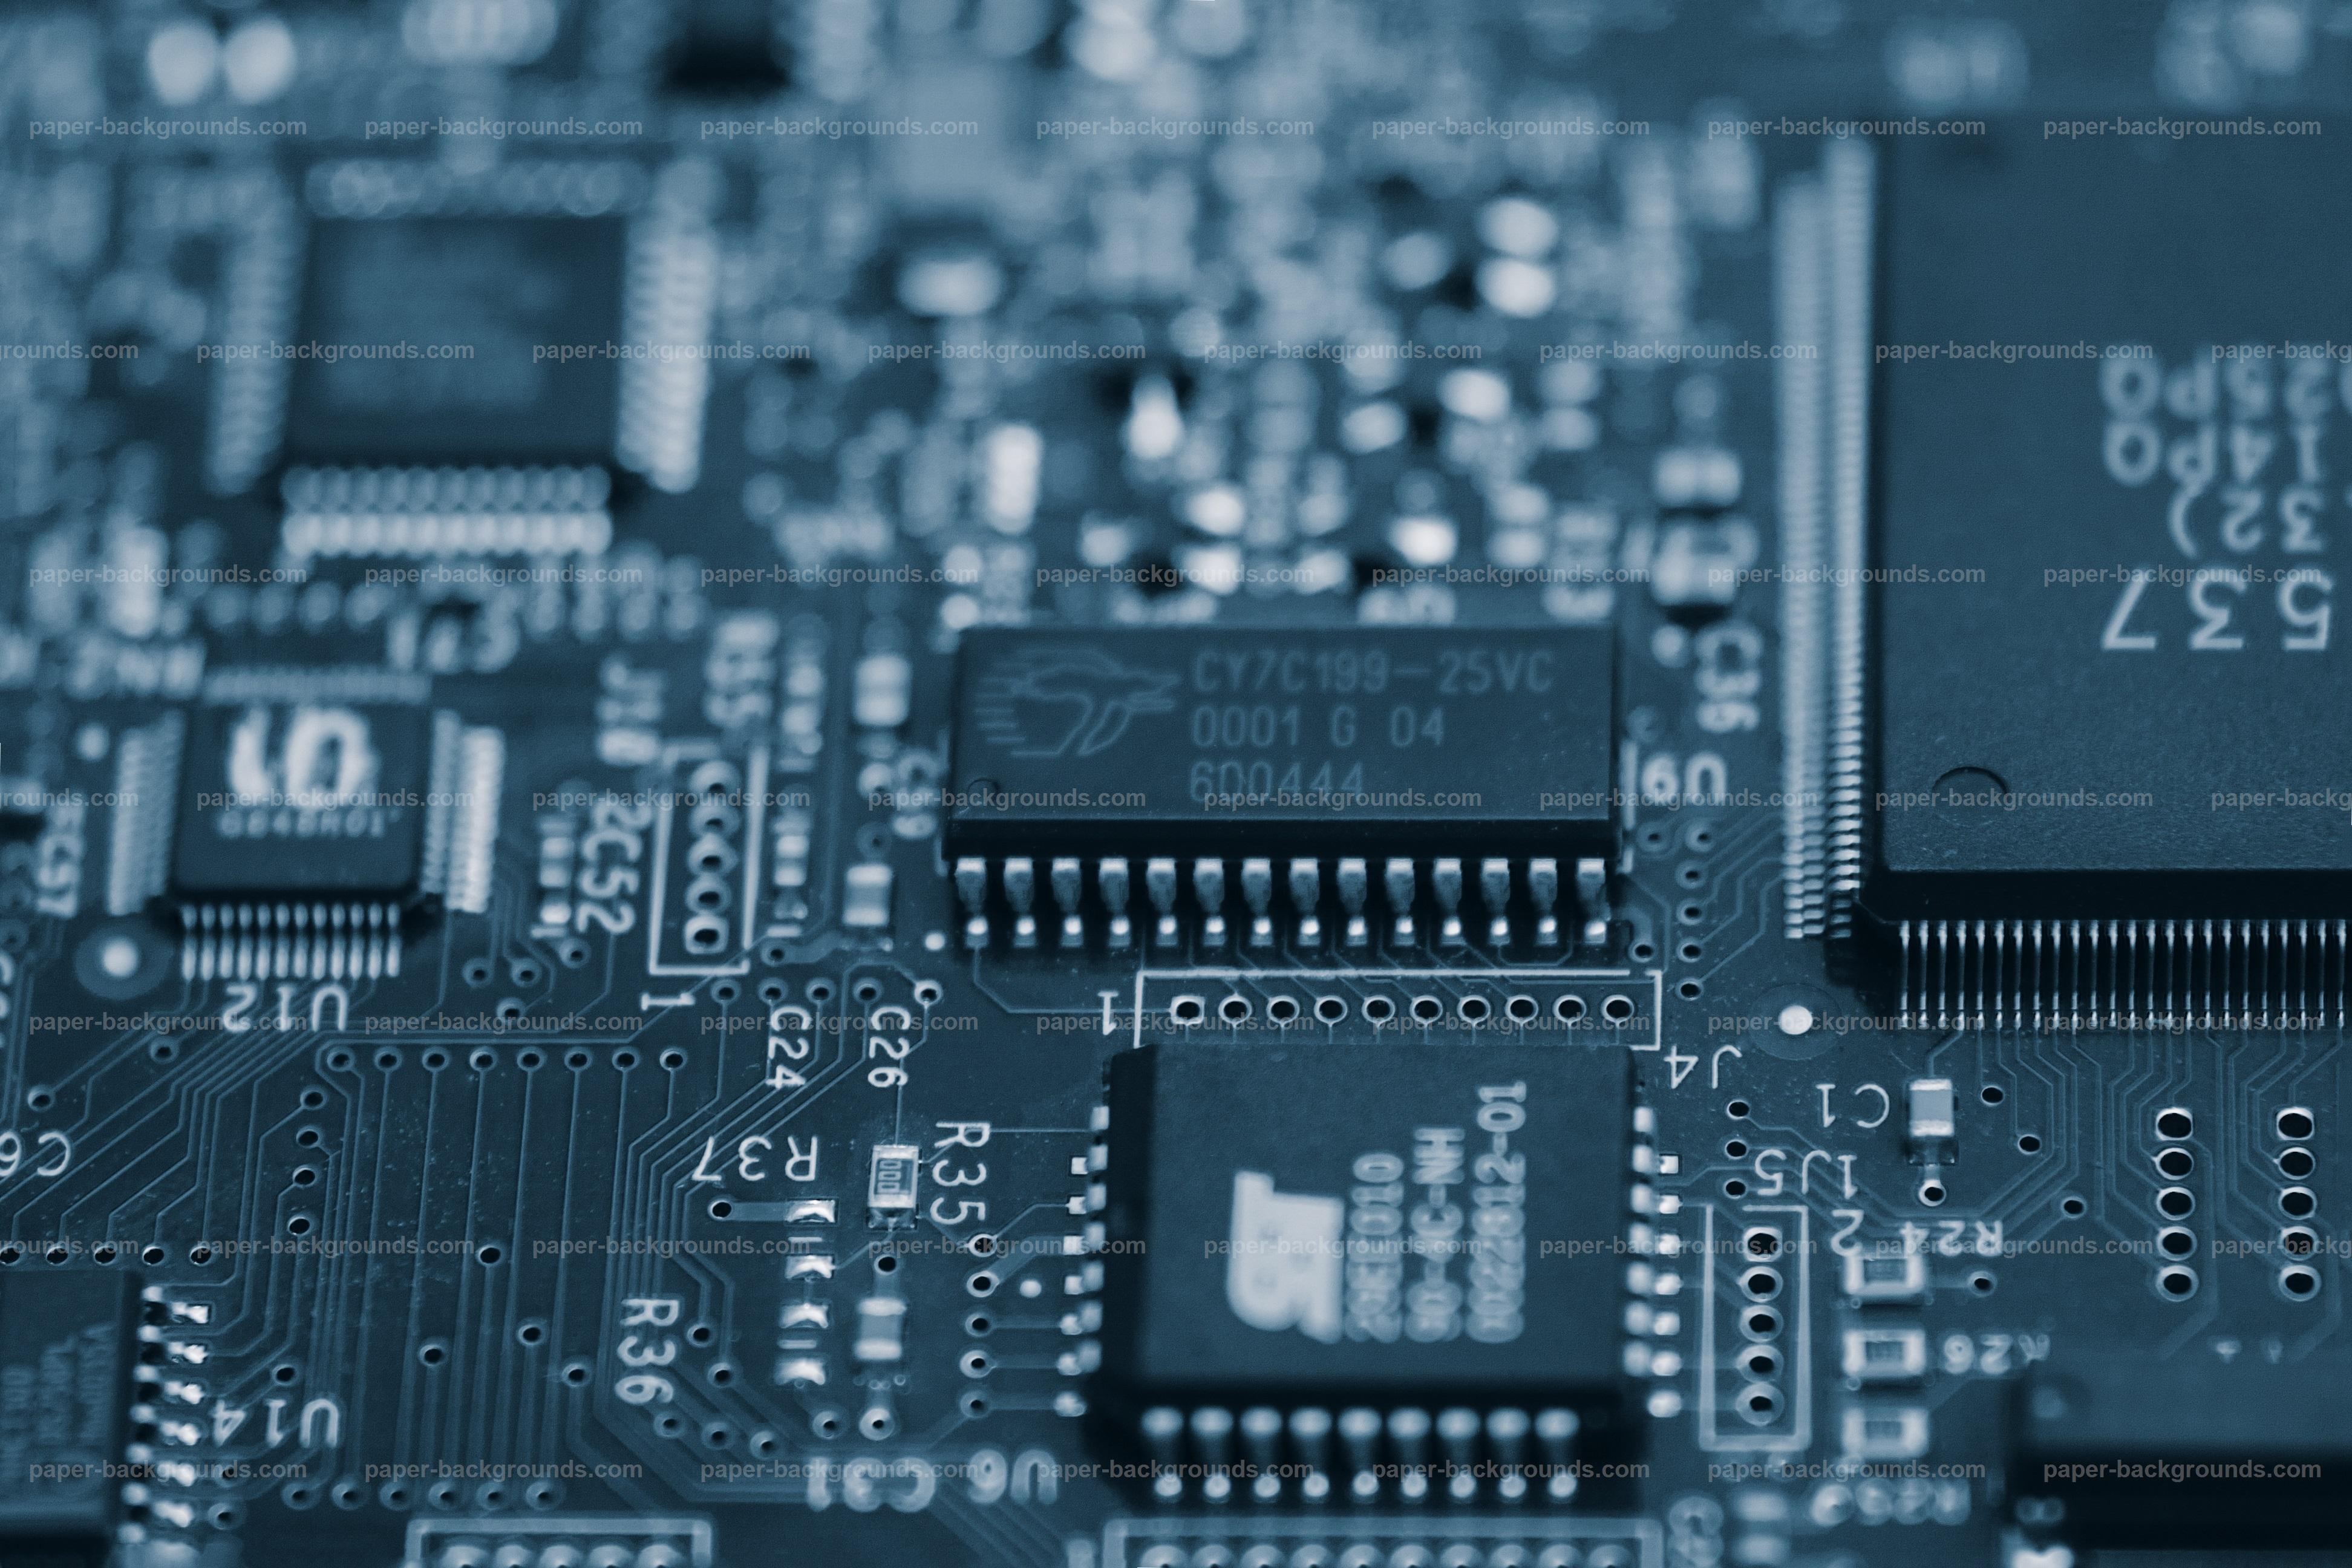 Wondrous Paper Backgrounds Blue Electronic Circuits Background Wiring Cloud Filiciilluminateatxorg